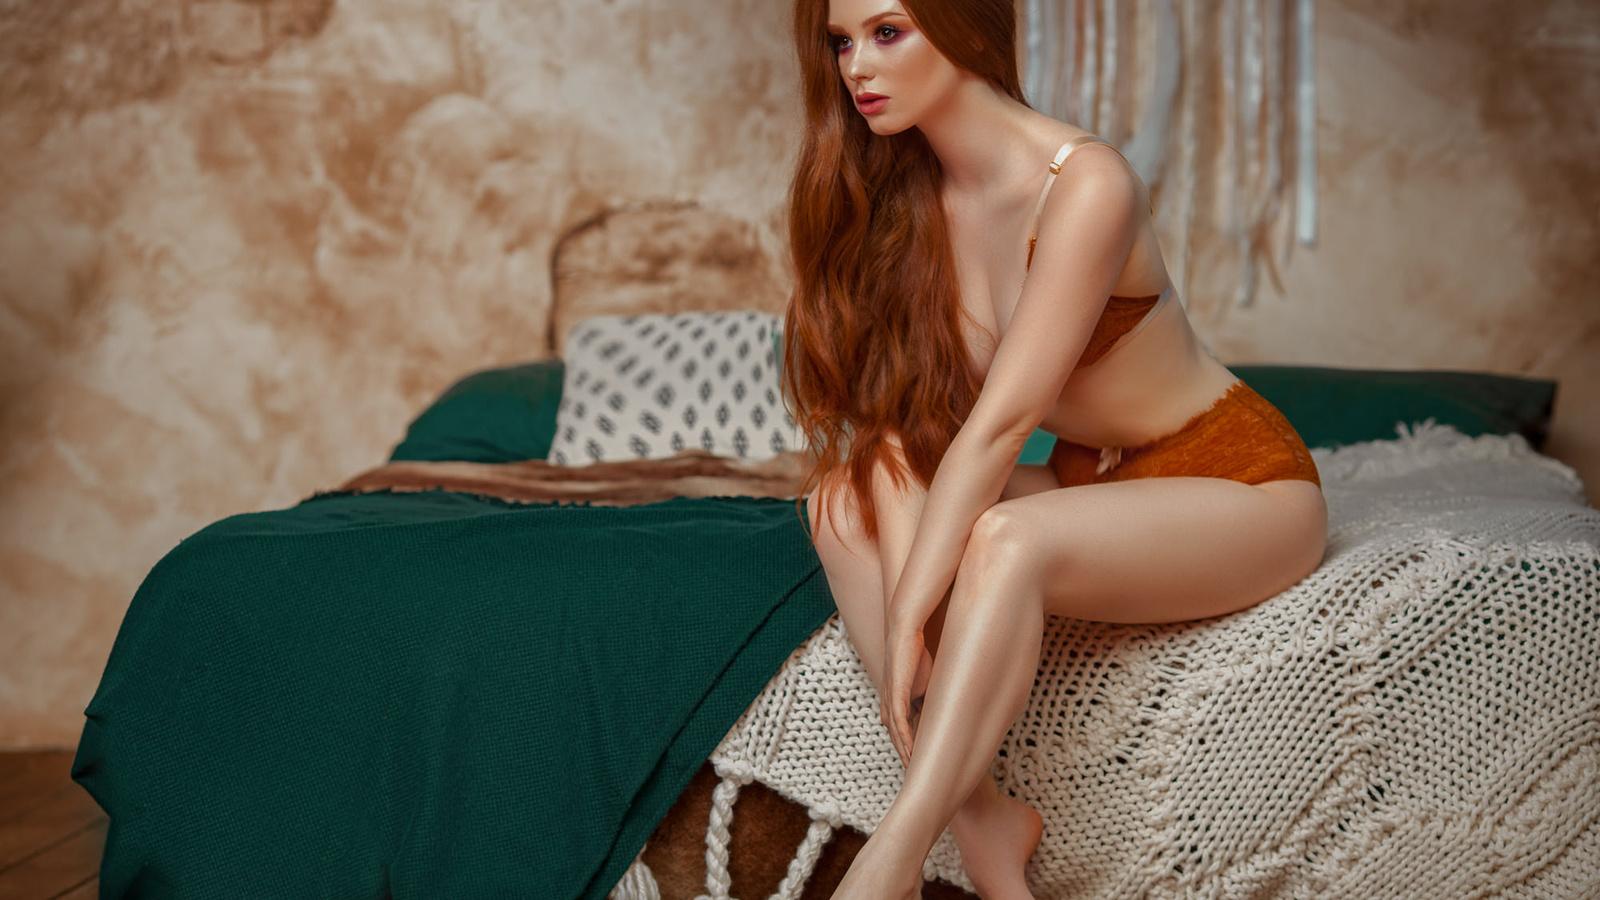 women, long hair, bed, sitting, pillow, wall, lingerie, looking away, make up, wooden floor